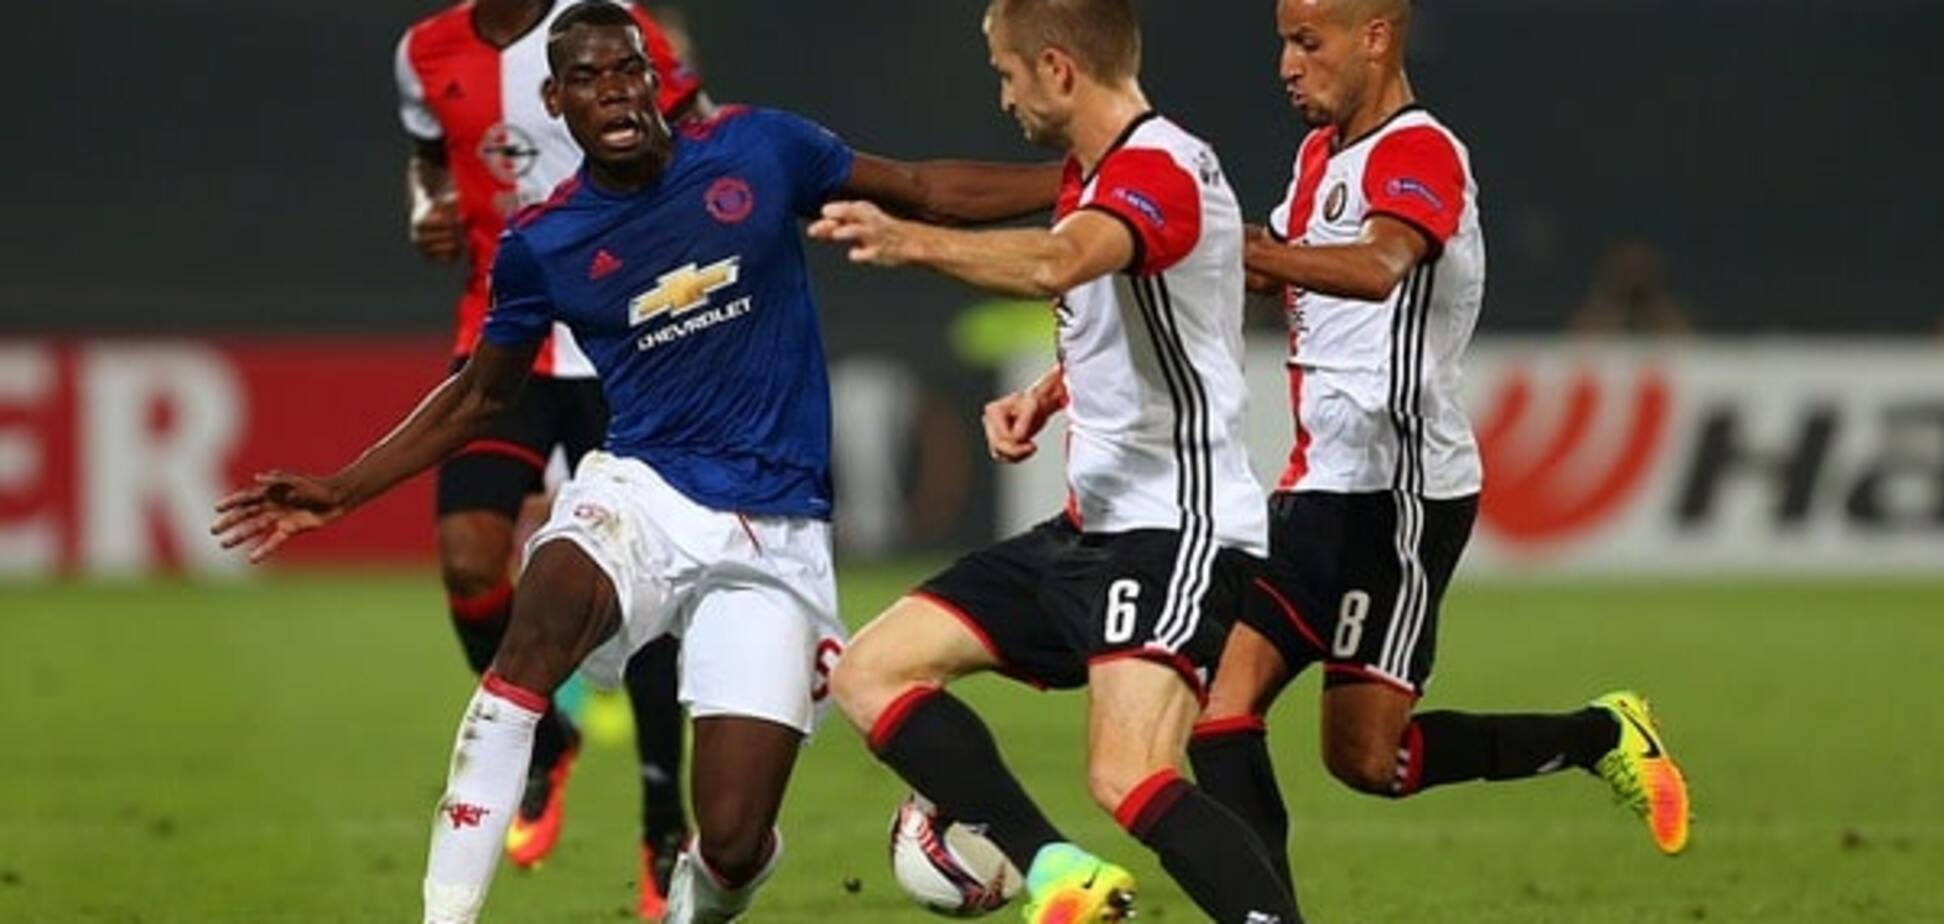 'Манчестер Юнайтед' сенсационно проиграл 'Фейеноорду': видеообзор